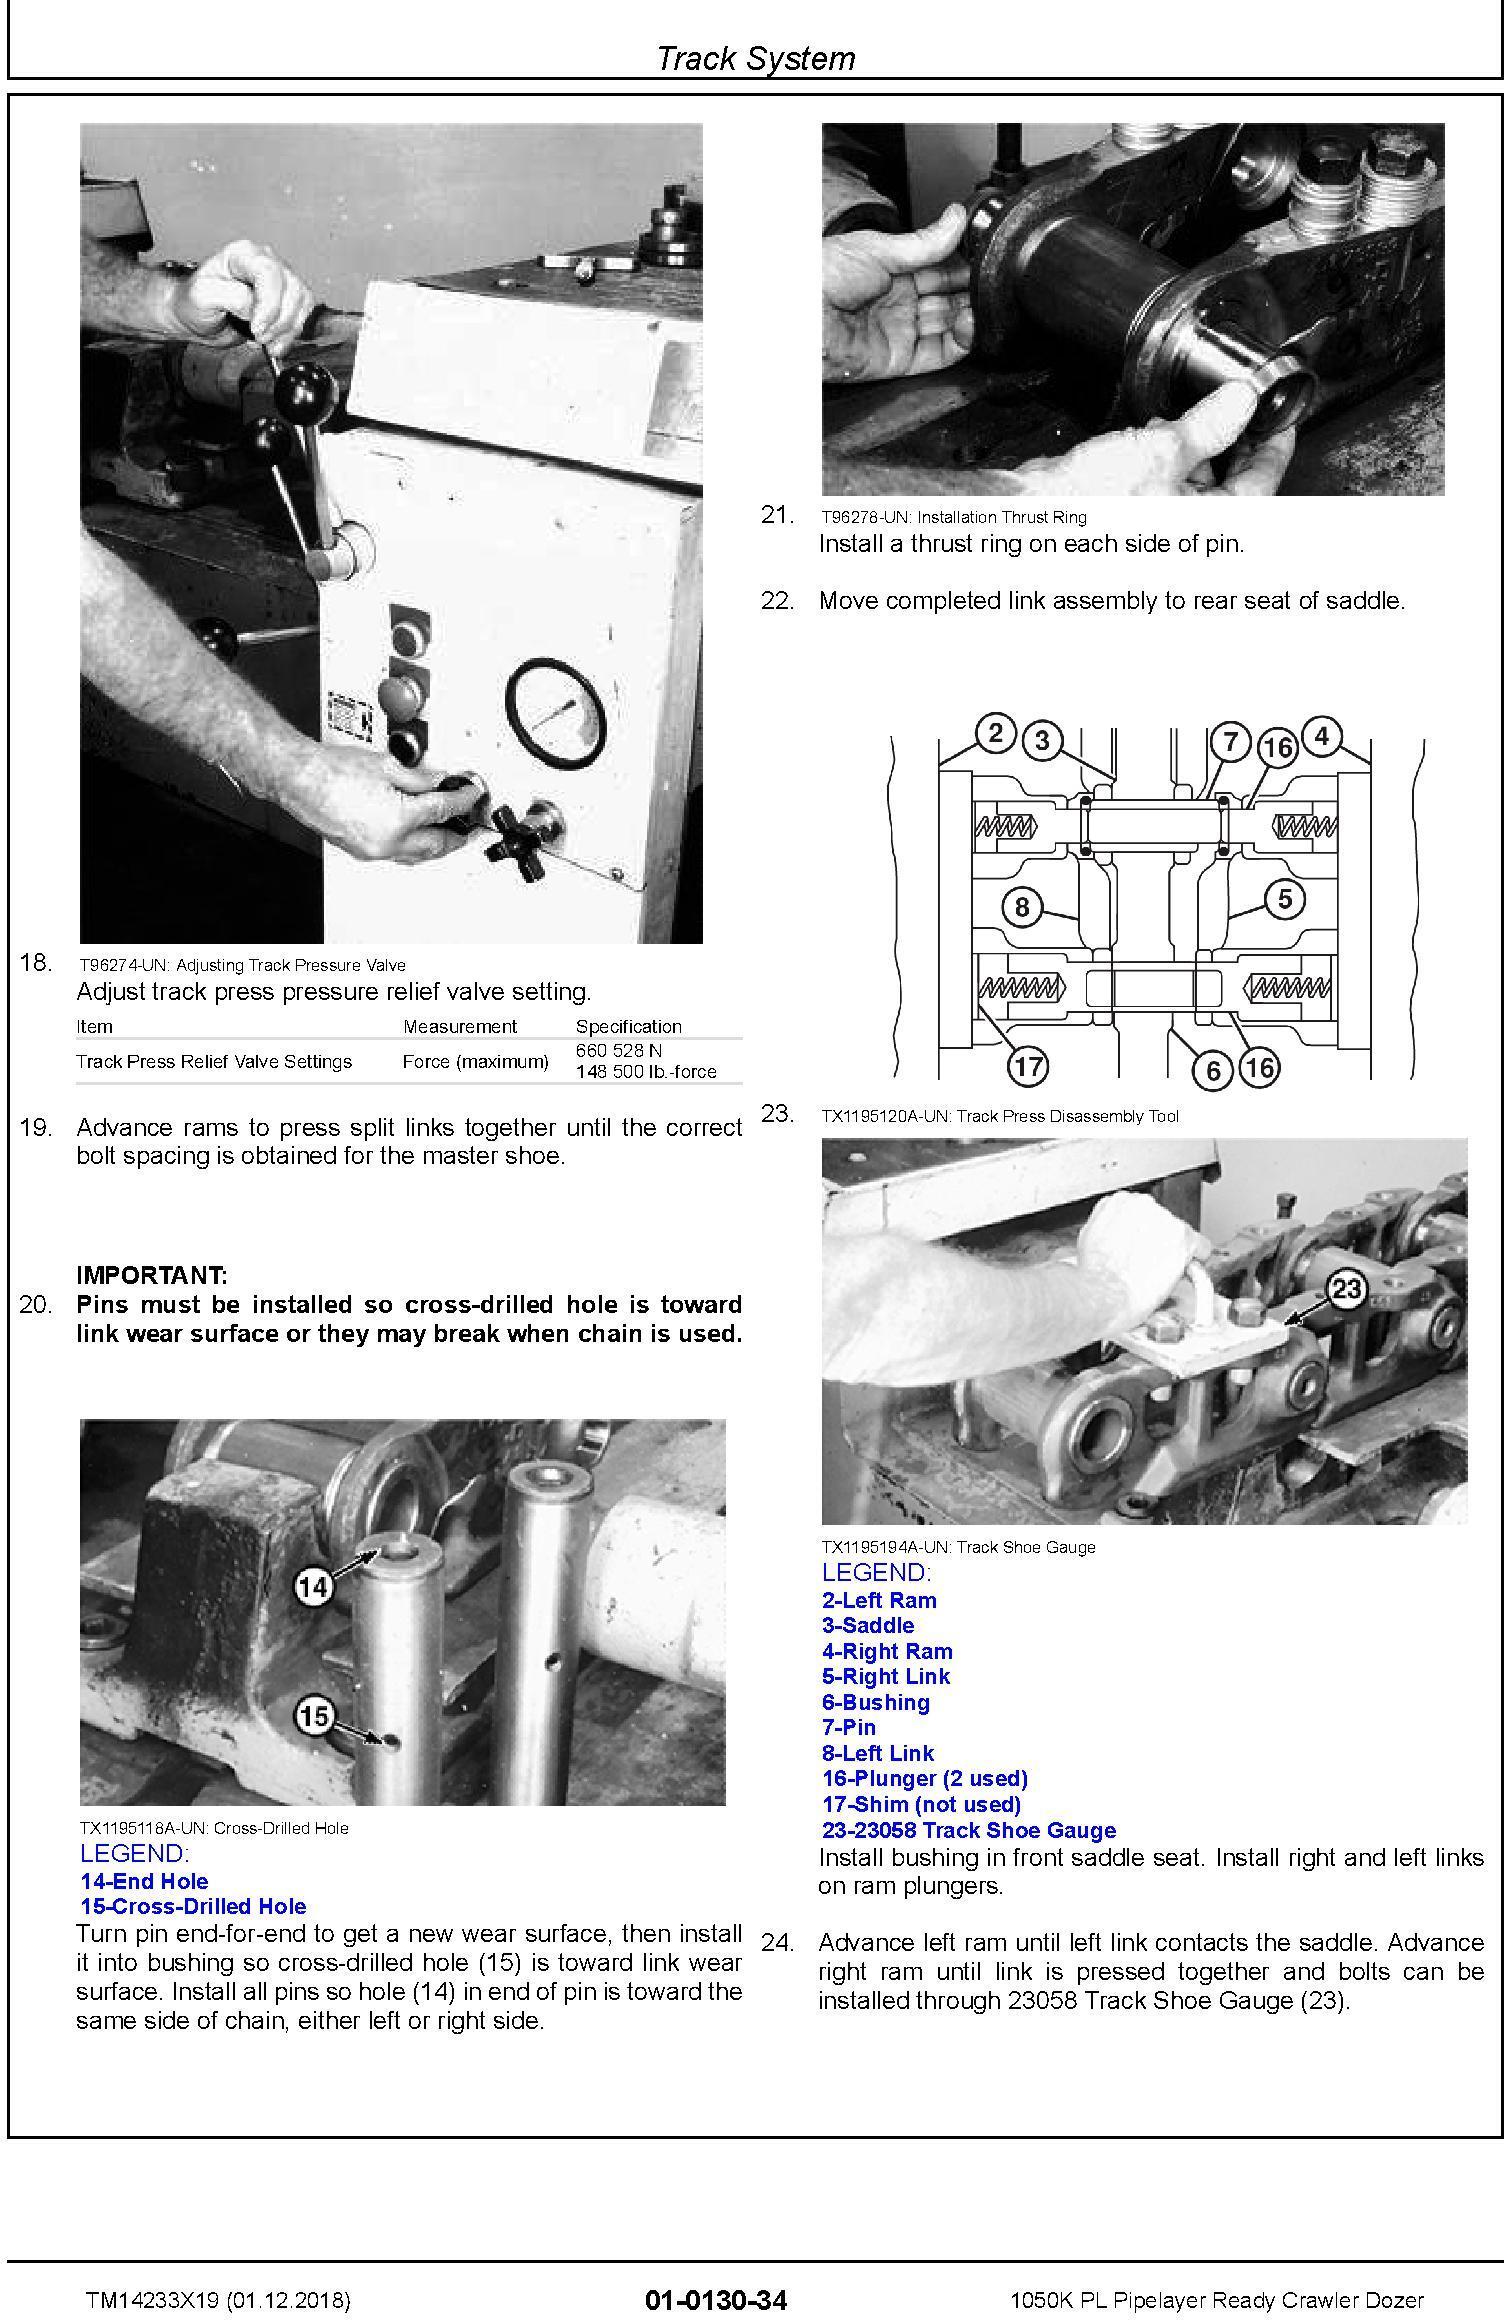 John Deere 1050K PL (SN. F310922-318801) Pipelayer Ready Crawler Dozer Repair Manual (TM14233X19) - 2